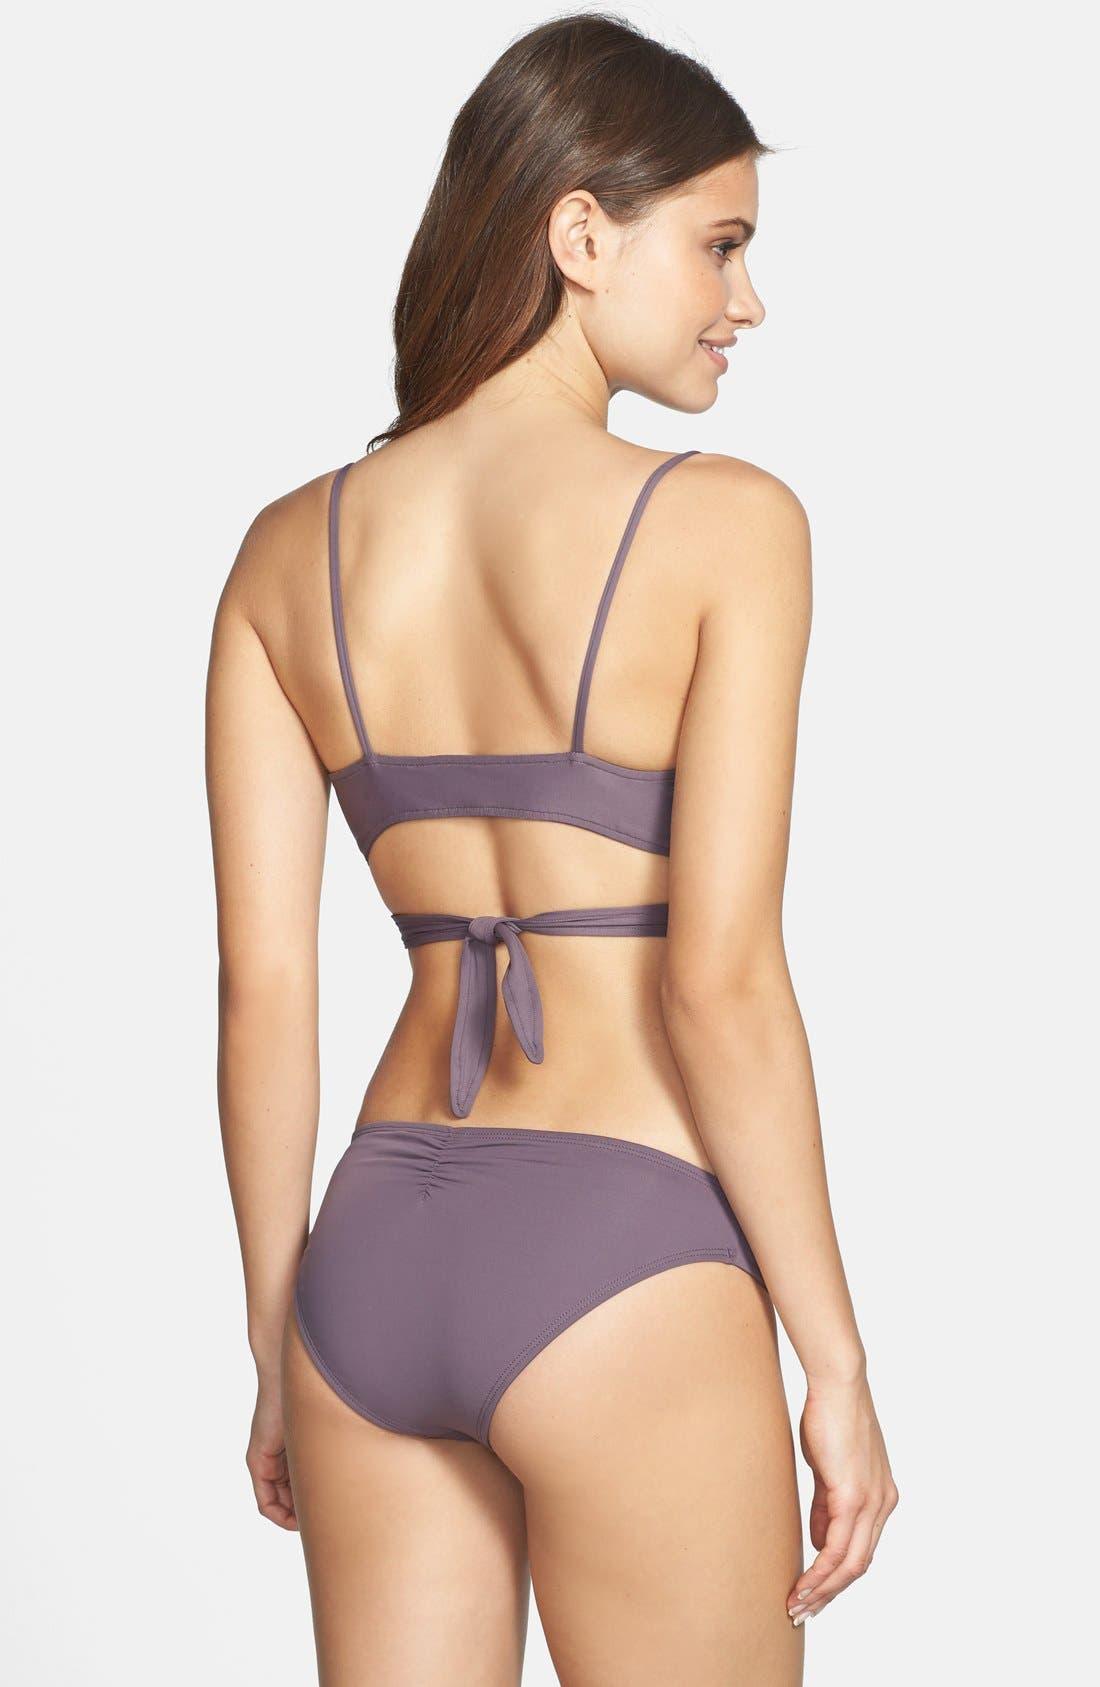 Chloe Wrap Bikini Top,                             Alternate thumbnail 8, color,                             020